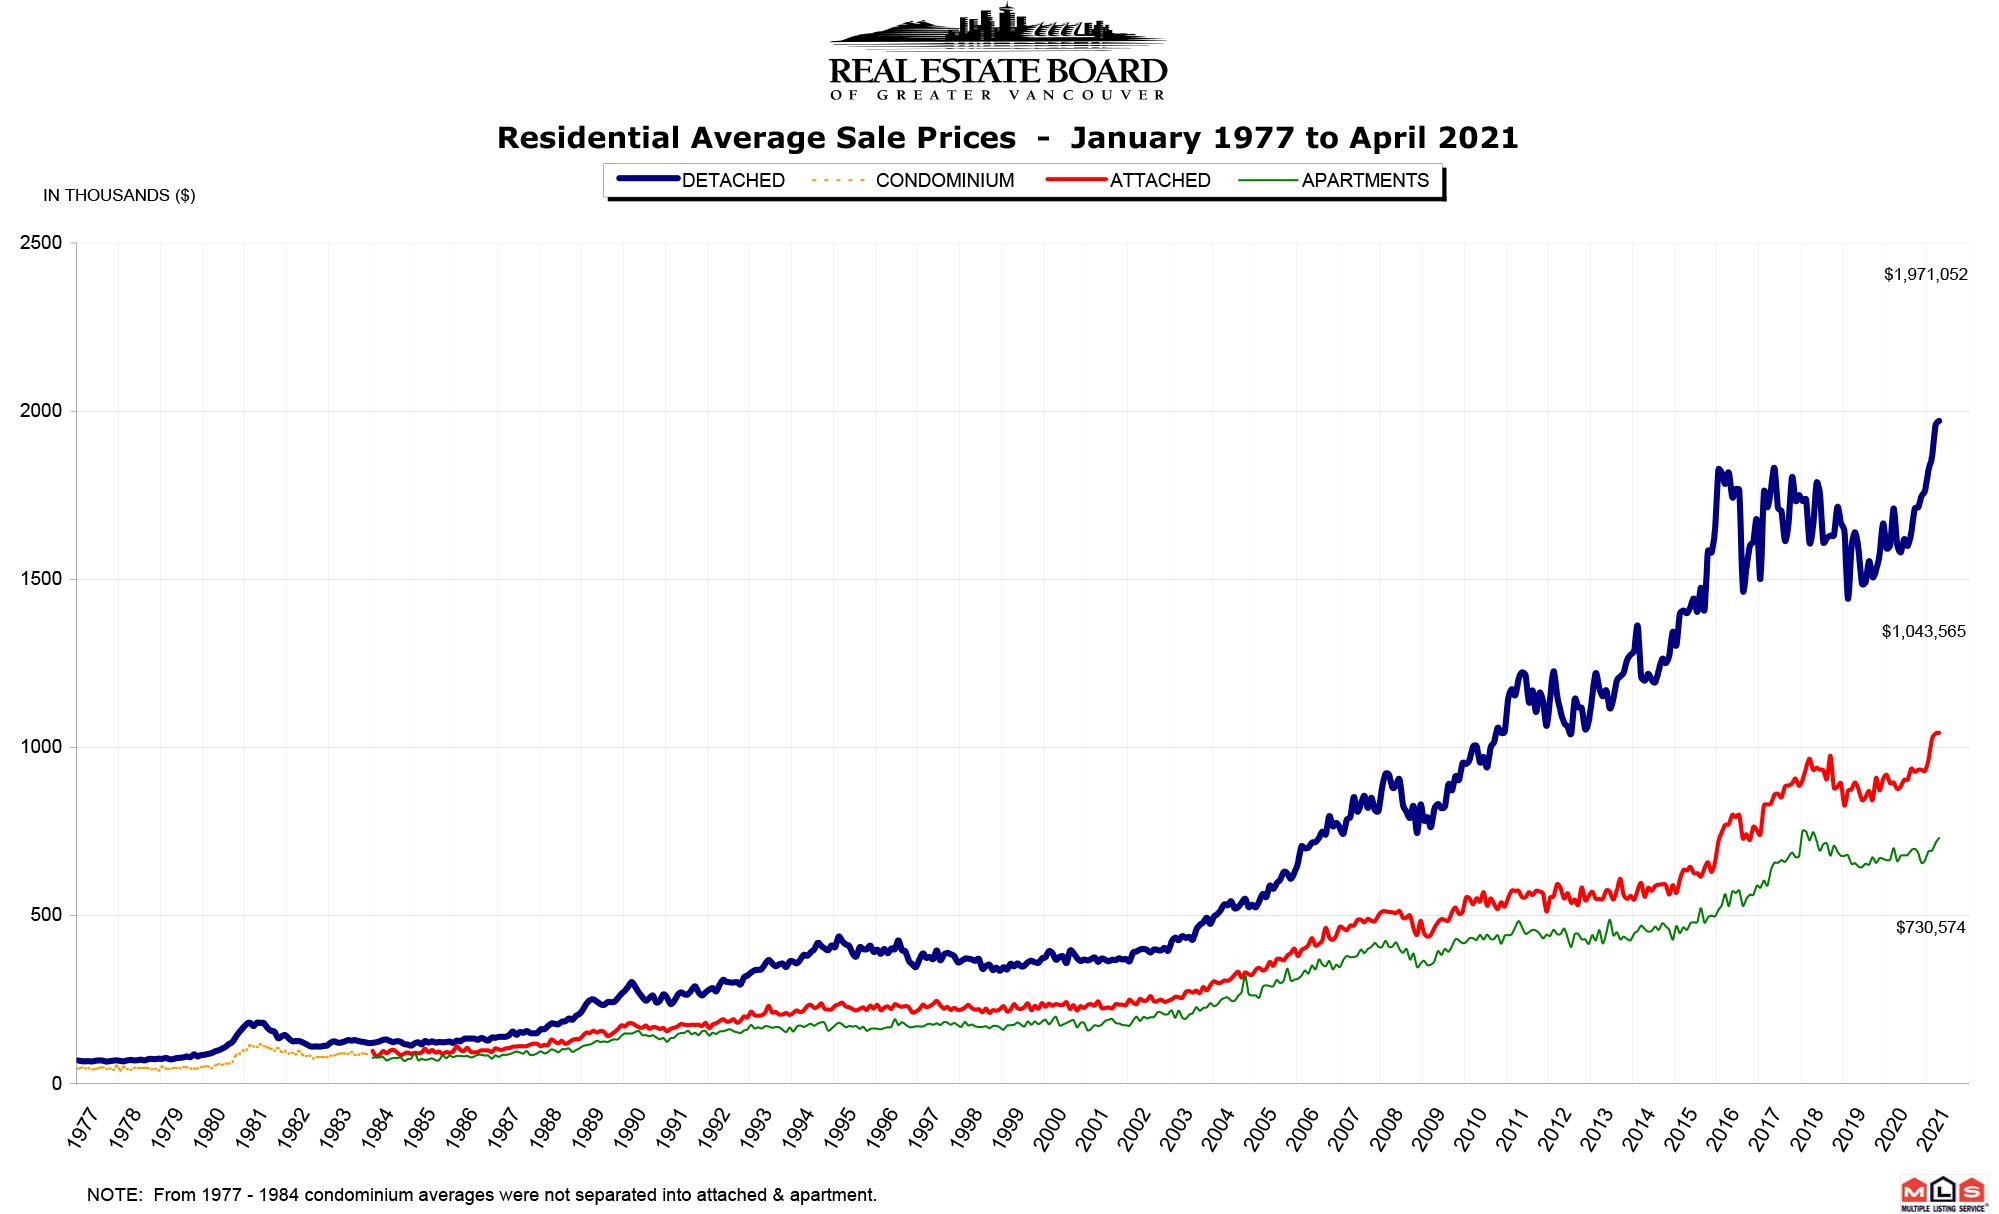 REBGV Stats Graph April 2021